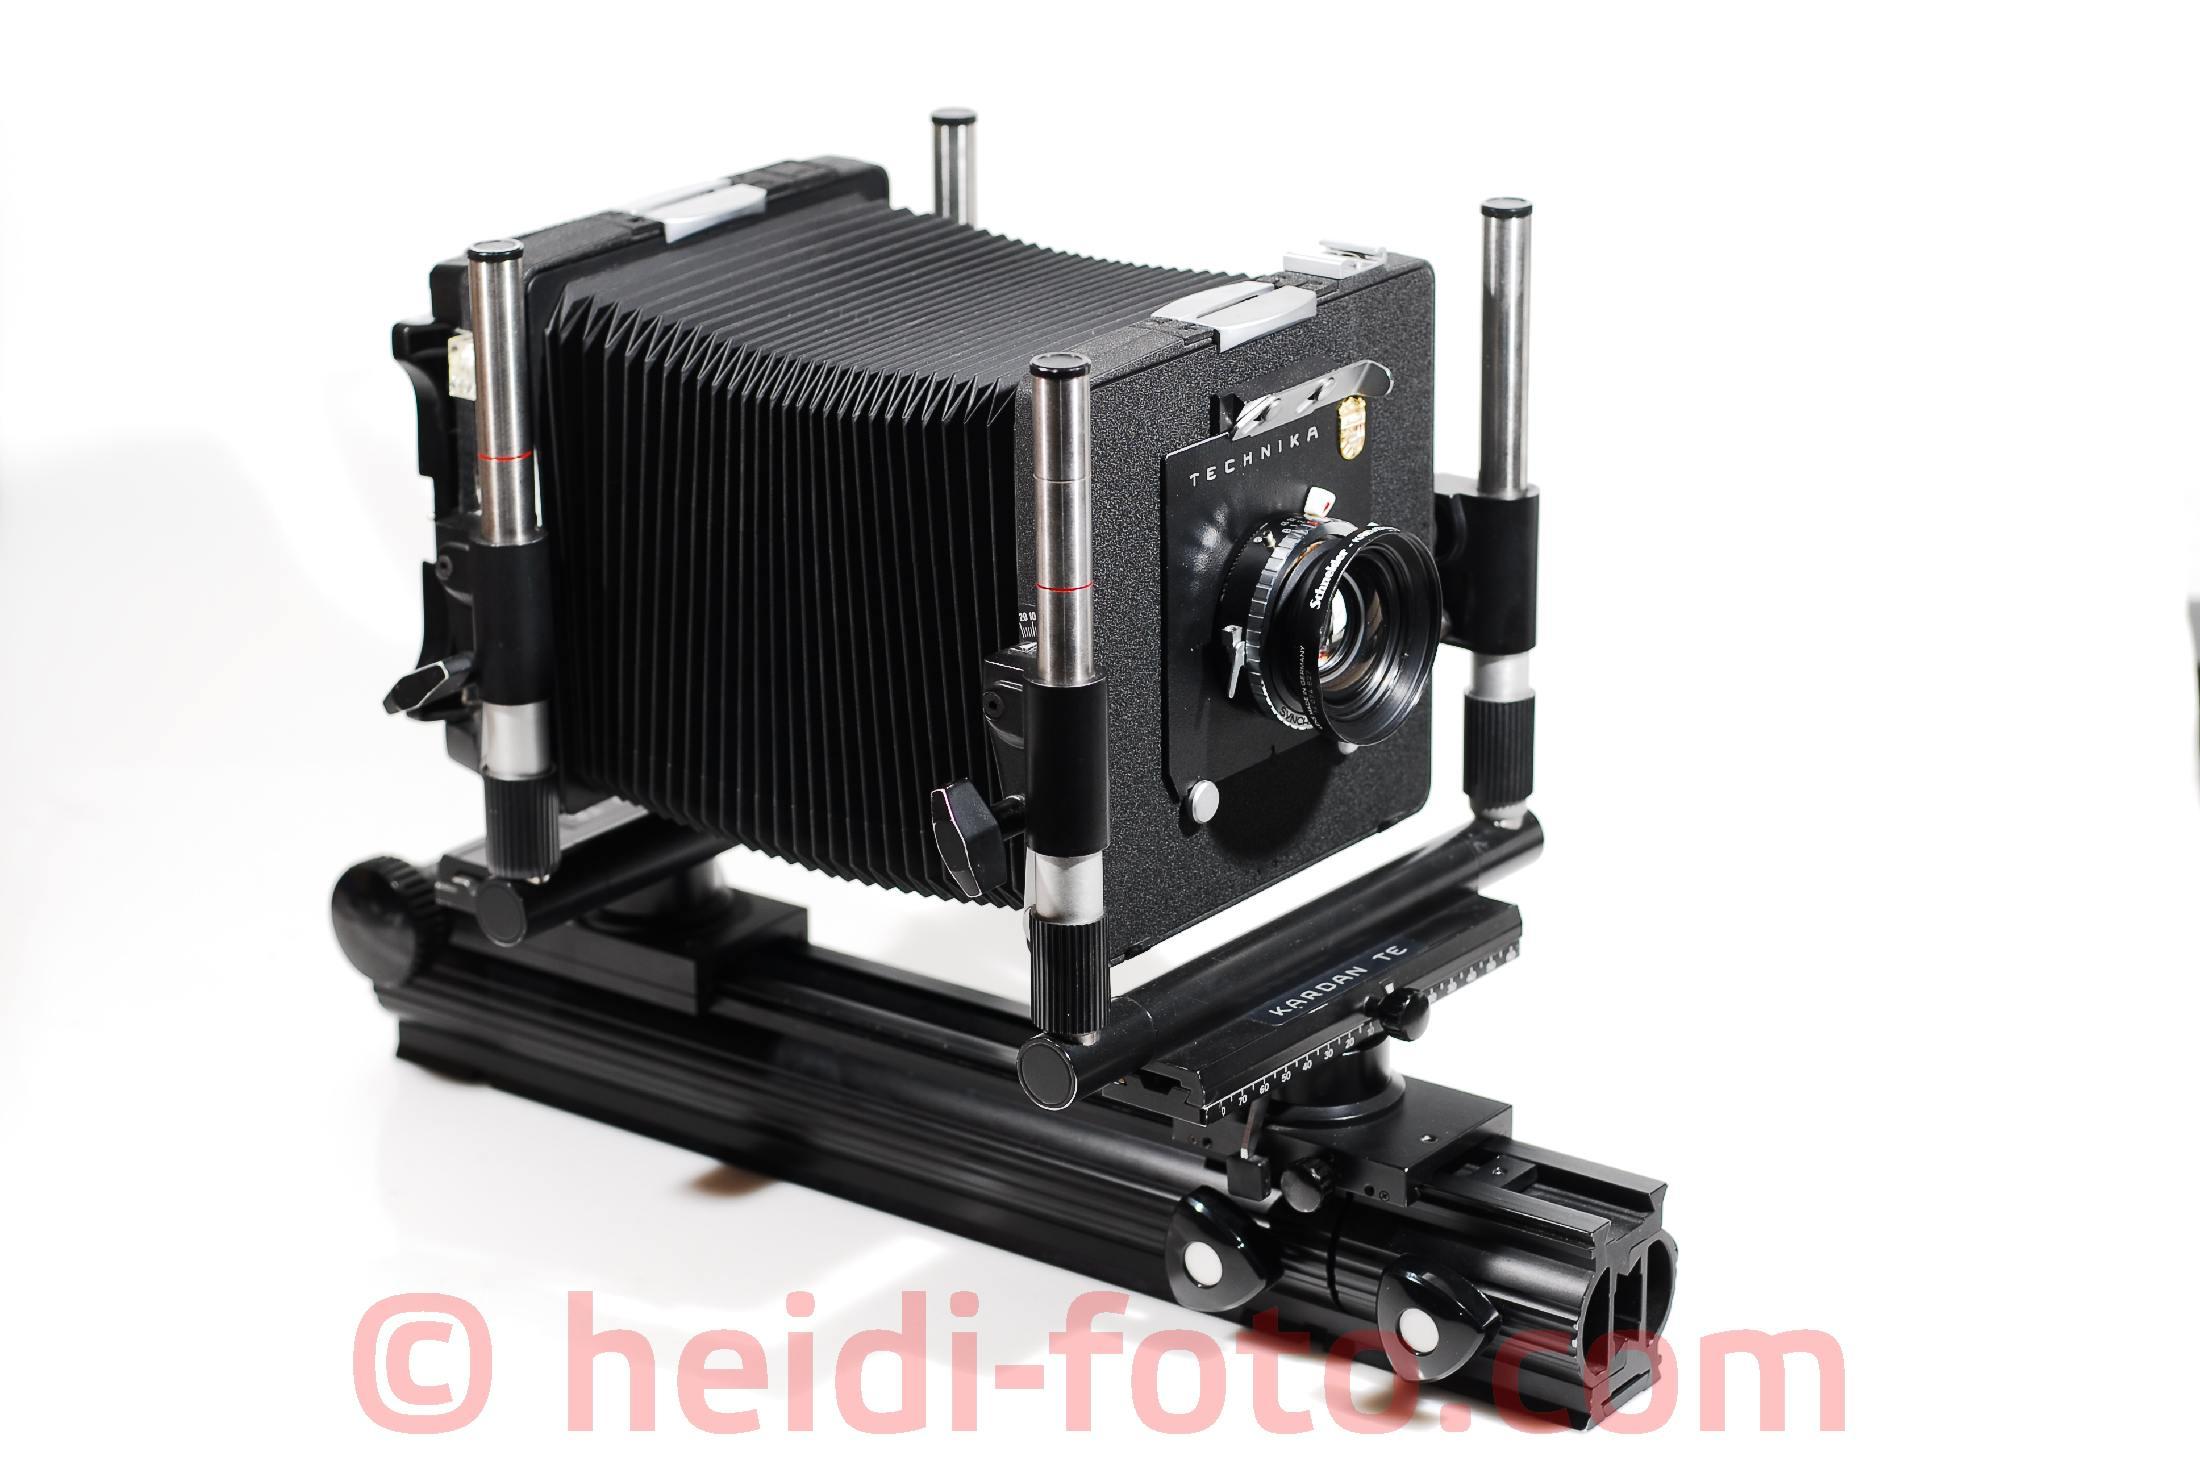 Linhof TE Technika Kardan m. 150mm/1:5.6 Symmar-S Schneider